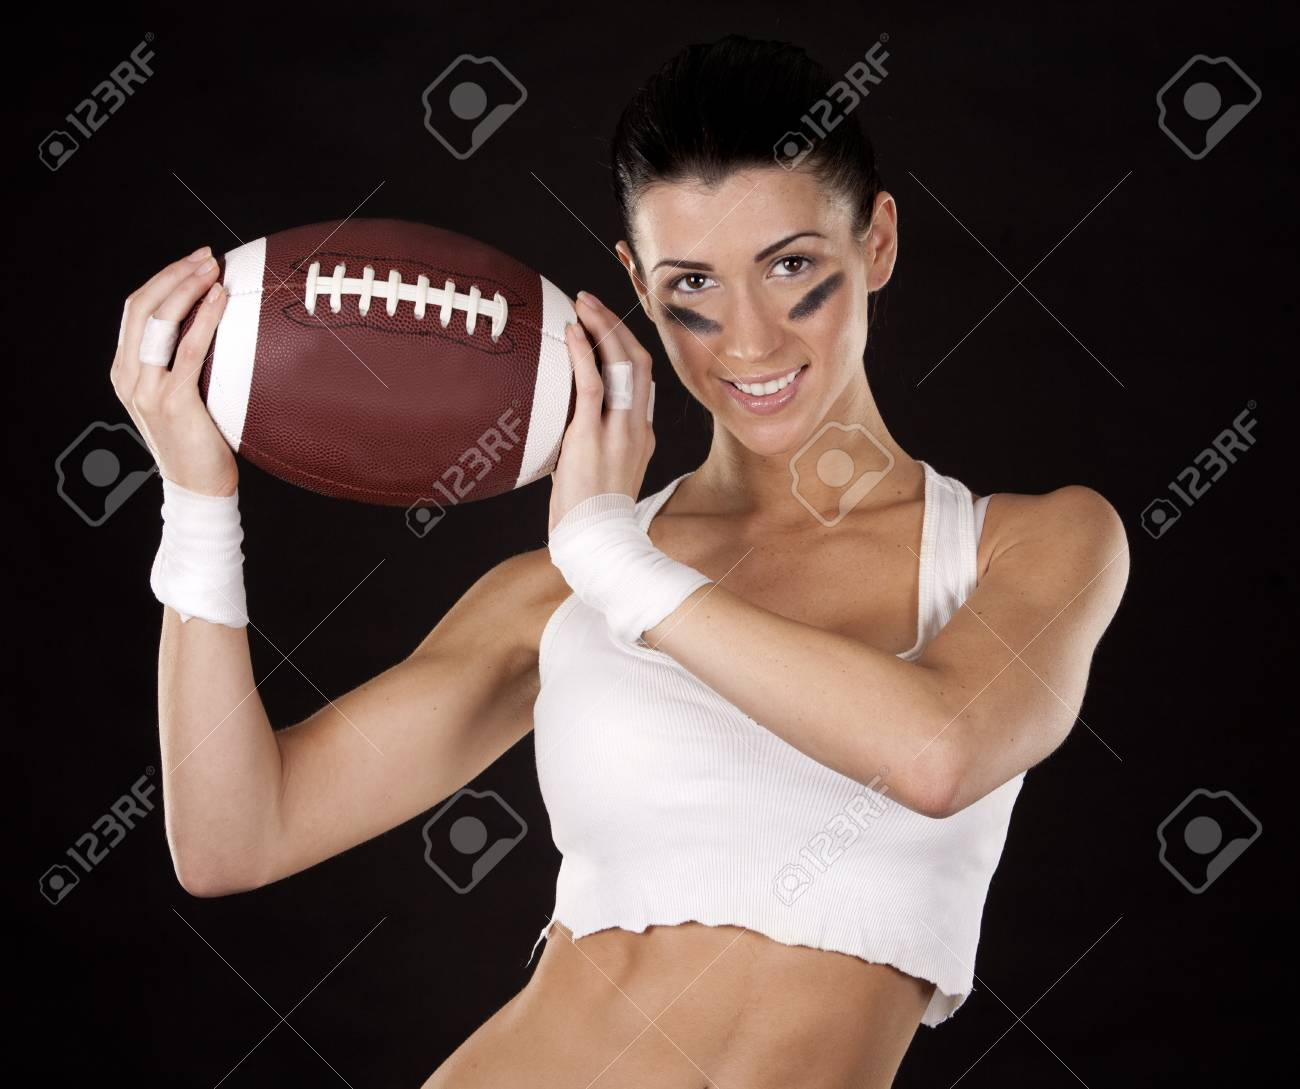 athletic brunette posing as american football girl on black background Stock Photo - 17573583